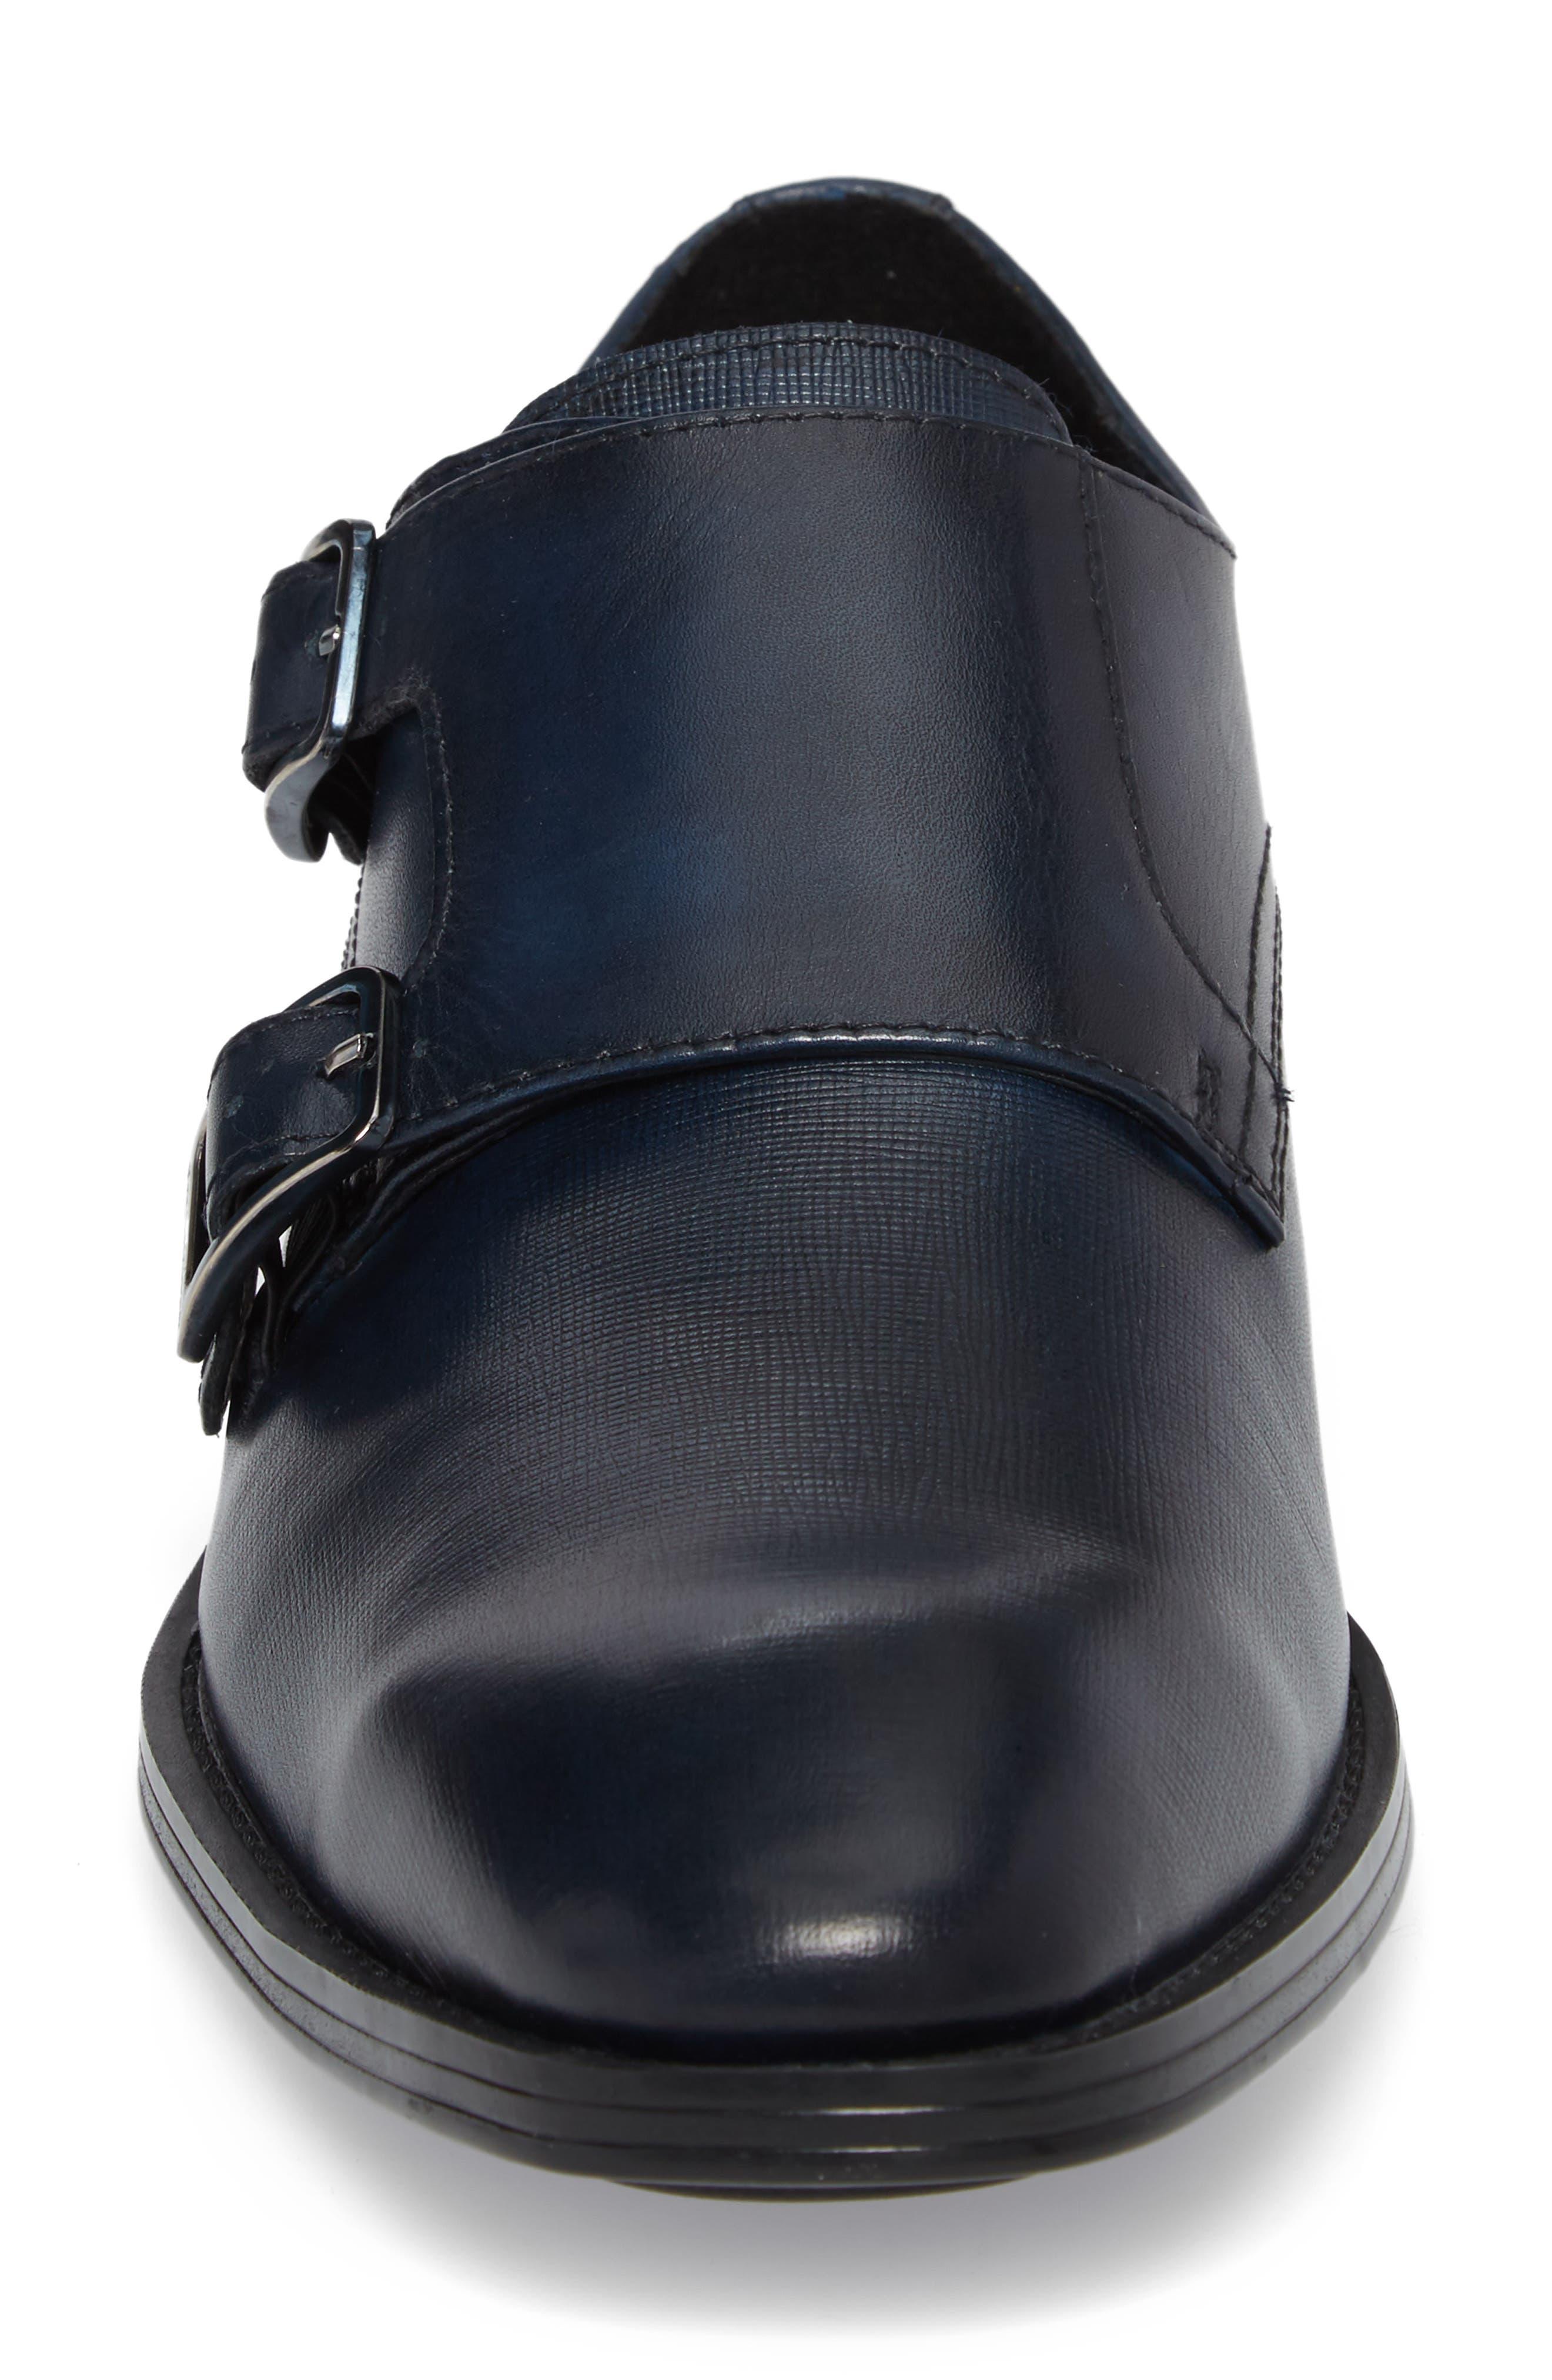 Karl Lagerfeld Double Strap Monk Shoe,                             Alternate thumbnail 4, color,                             Navy